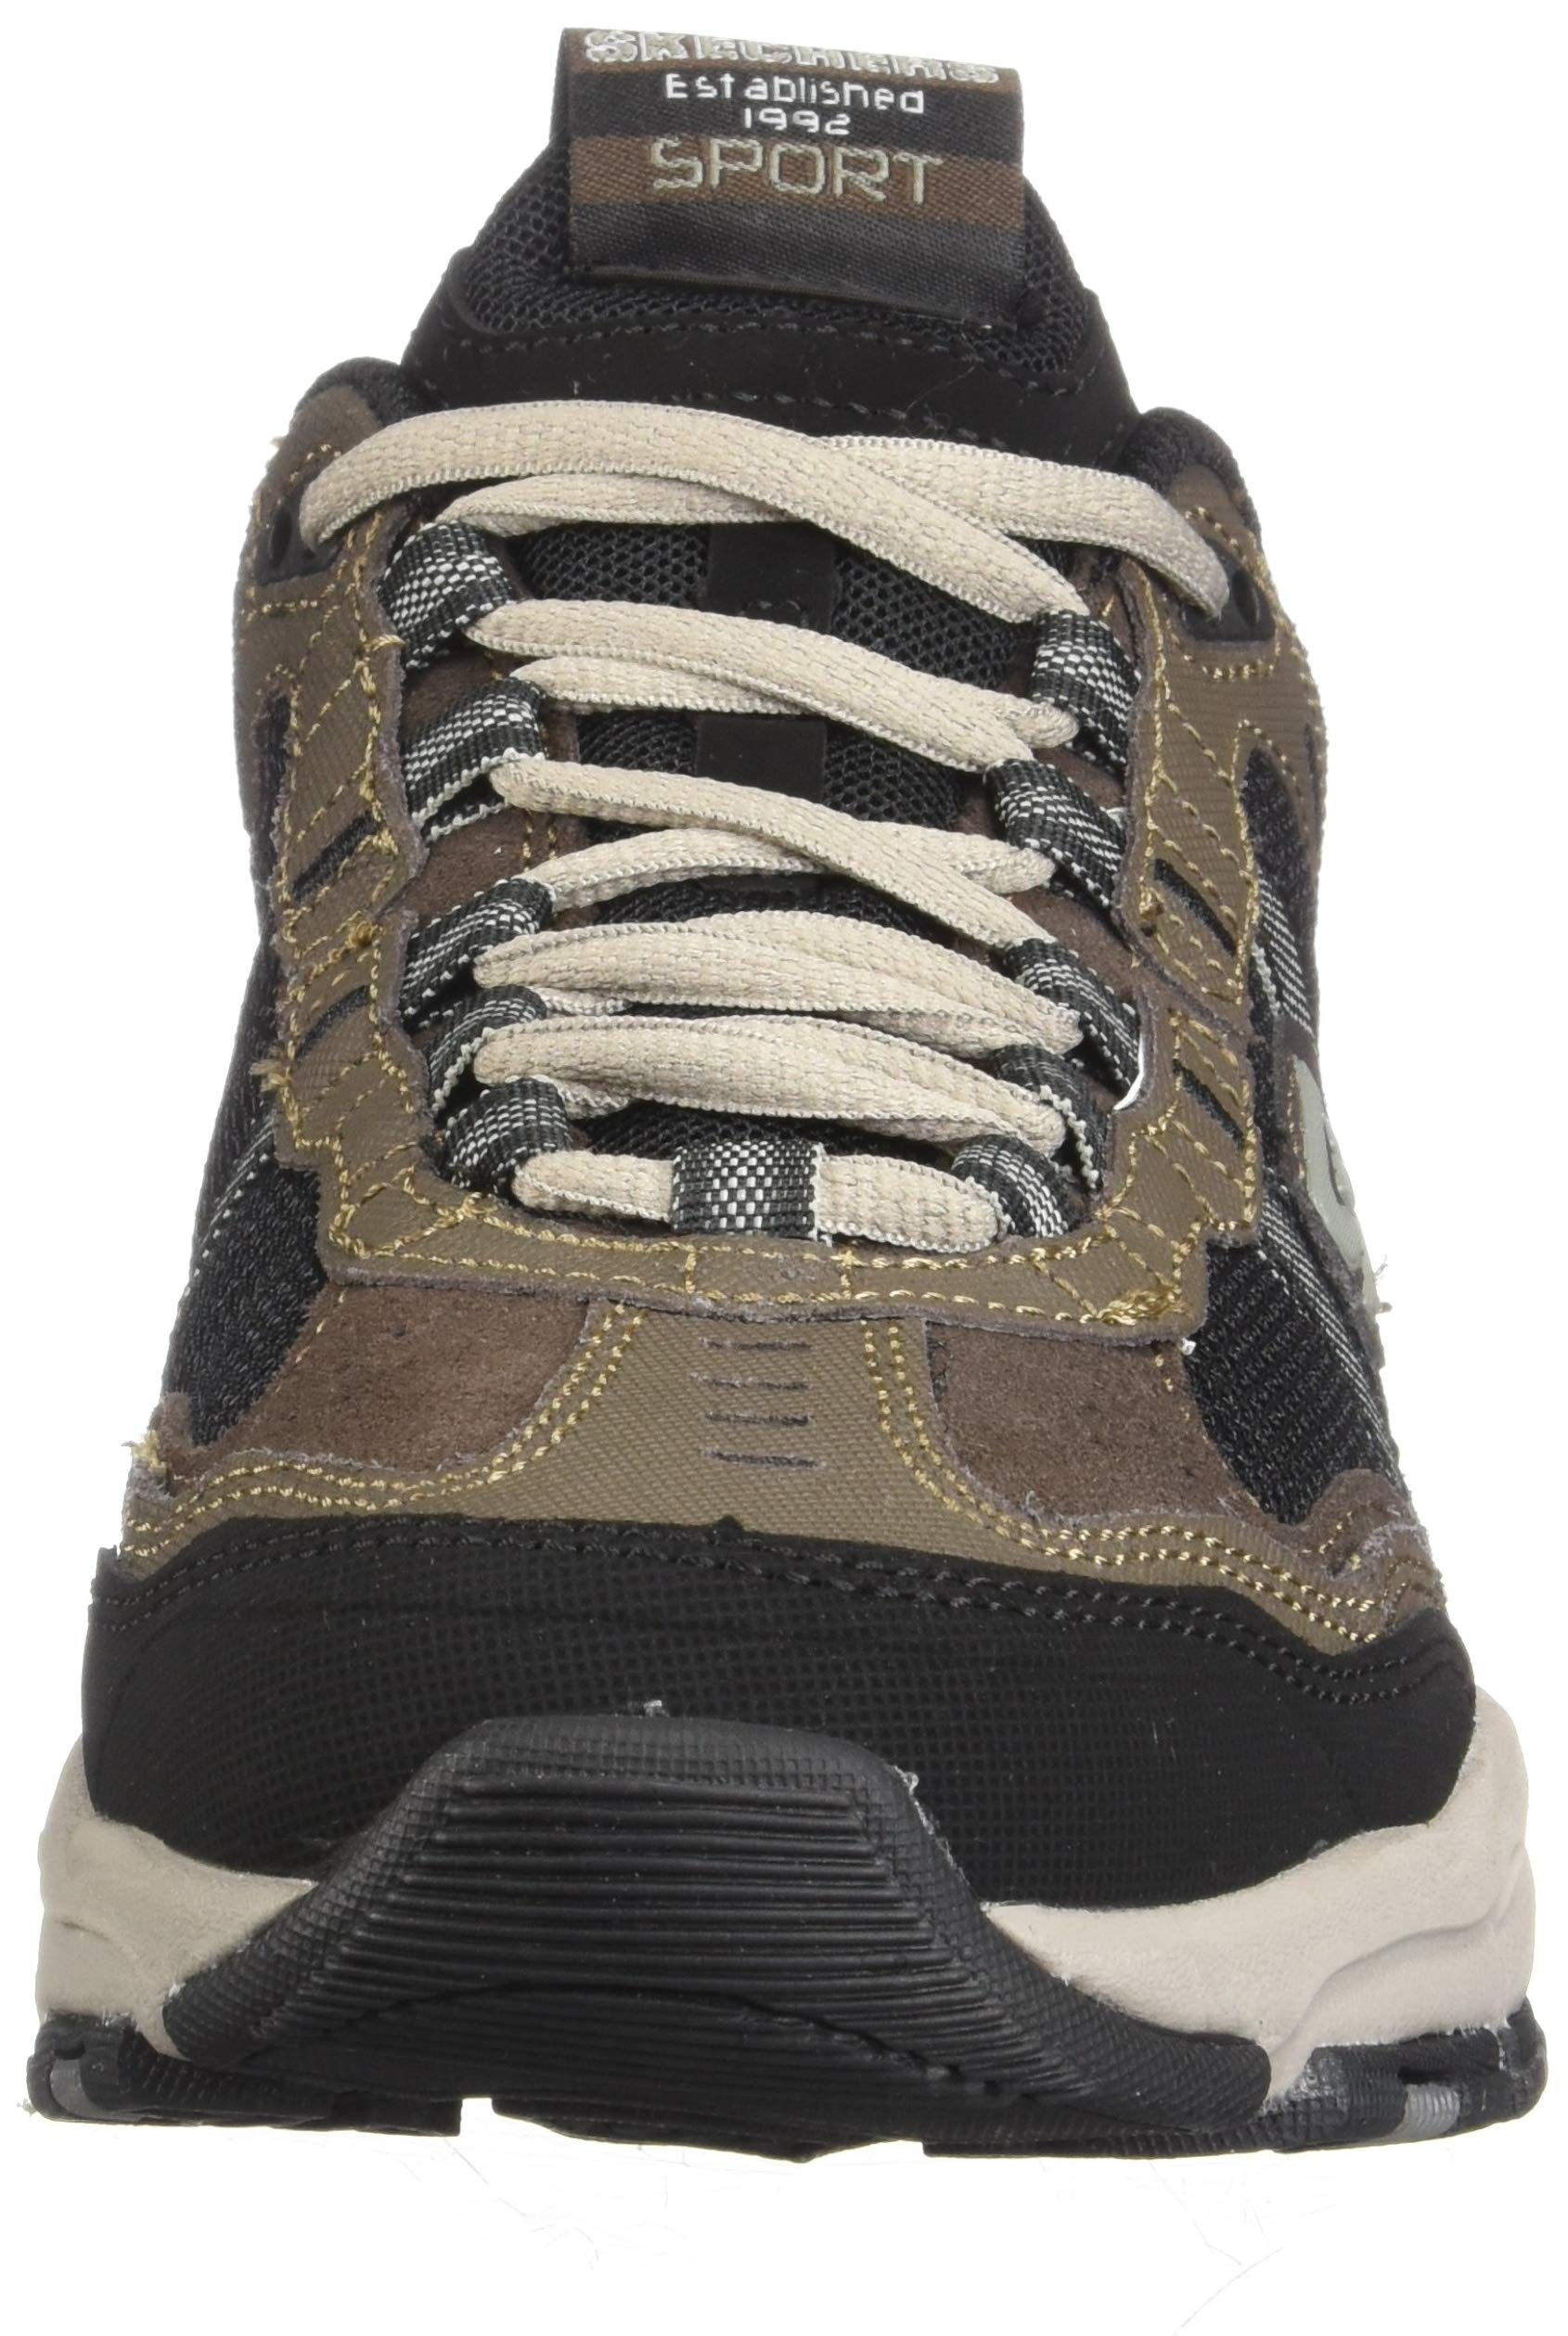 Skechers Sport Men's Vigor 2.0 Trait Memory Foam Sneaker, Brown/Black, 7 M US by Skechers (Image #4)